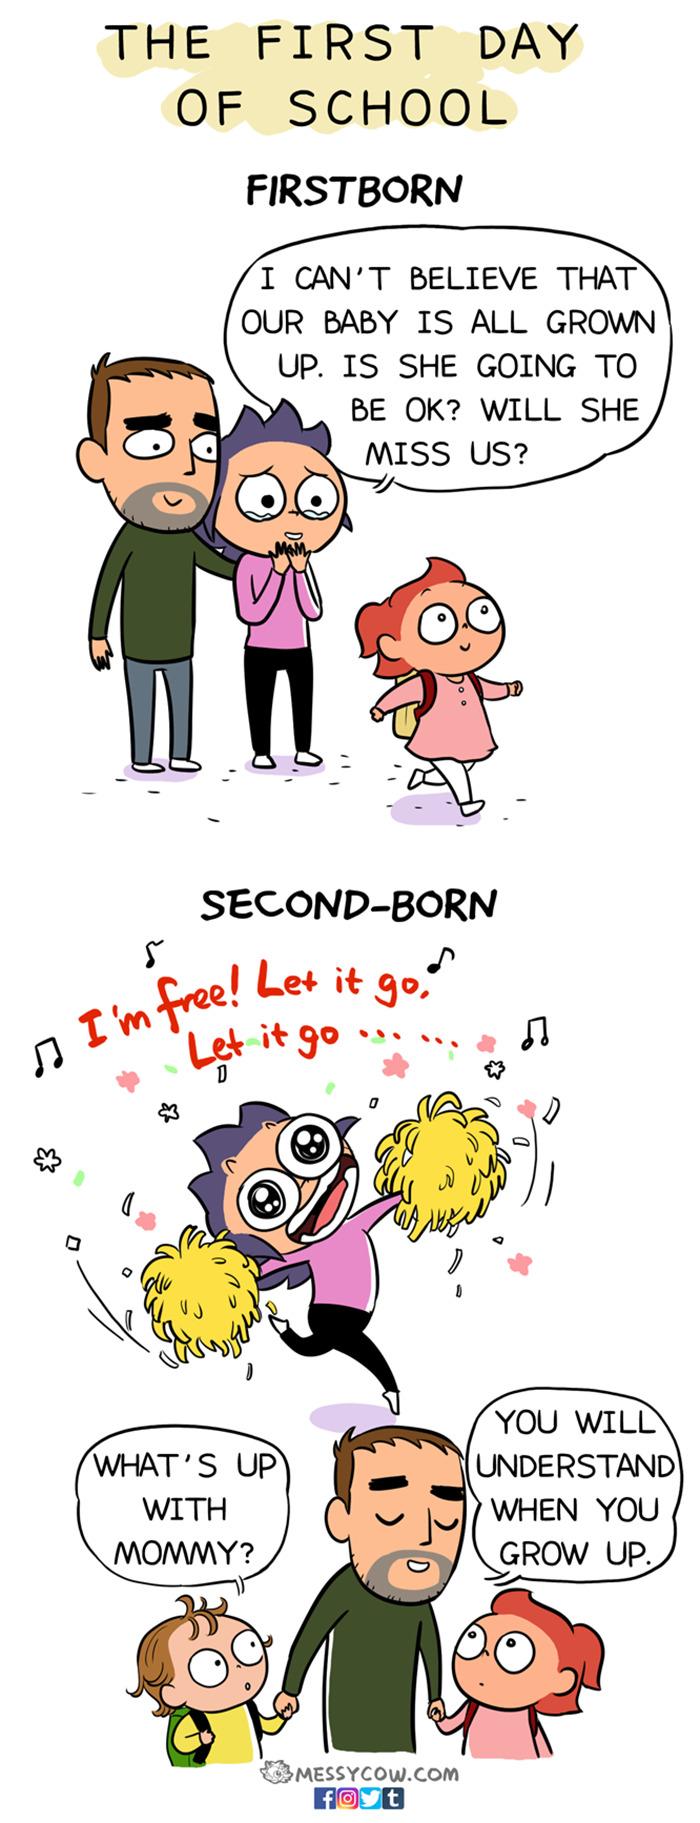 Weng Chen 大宝与二宝的漫画